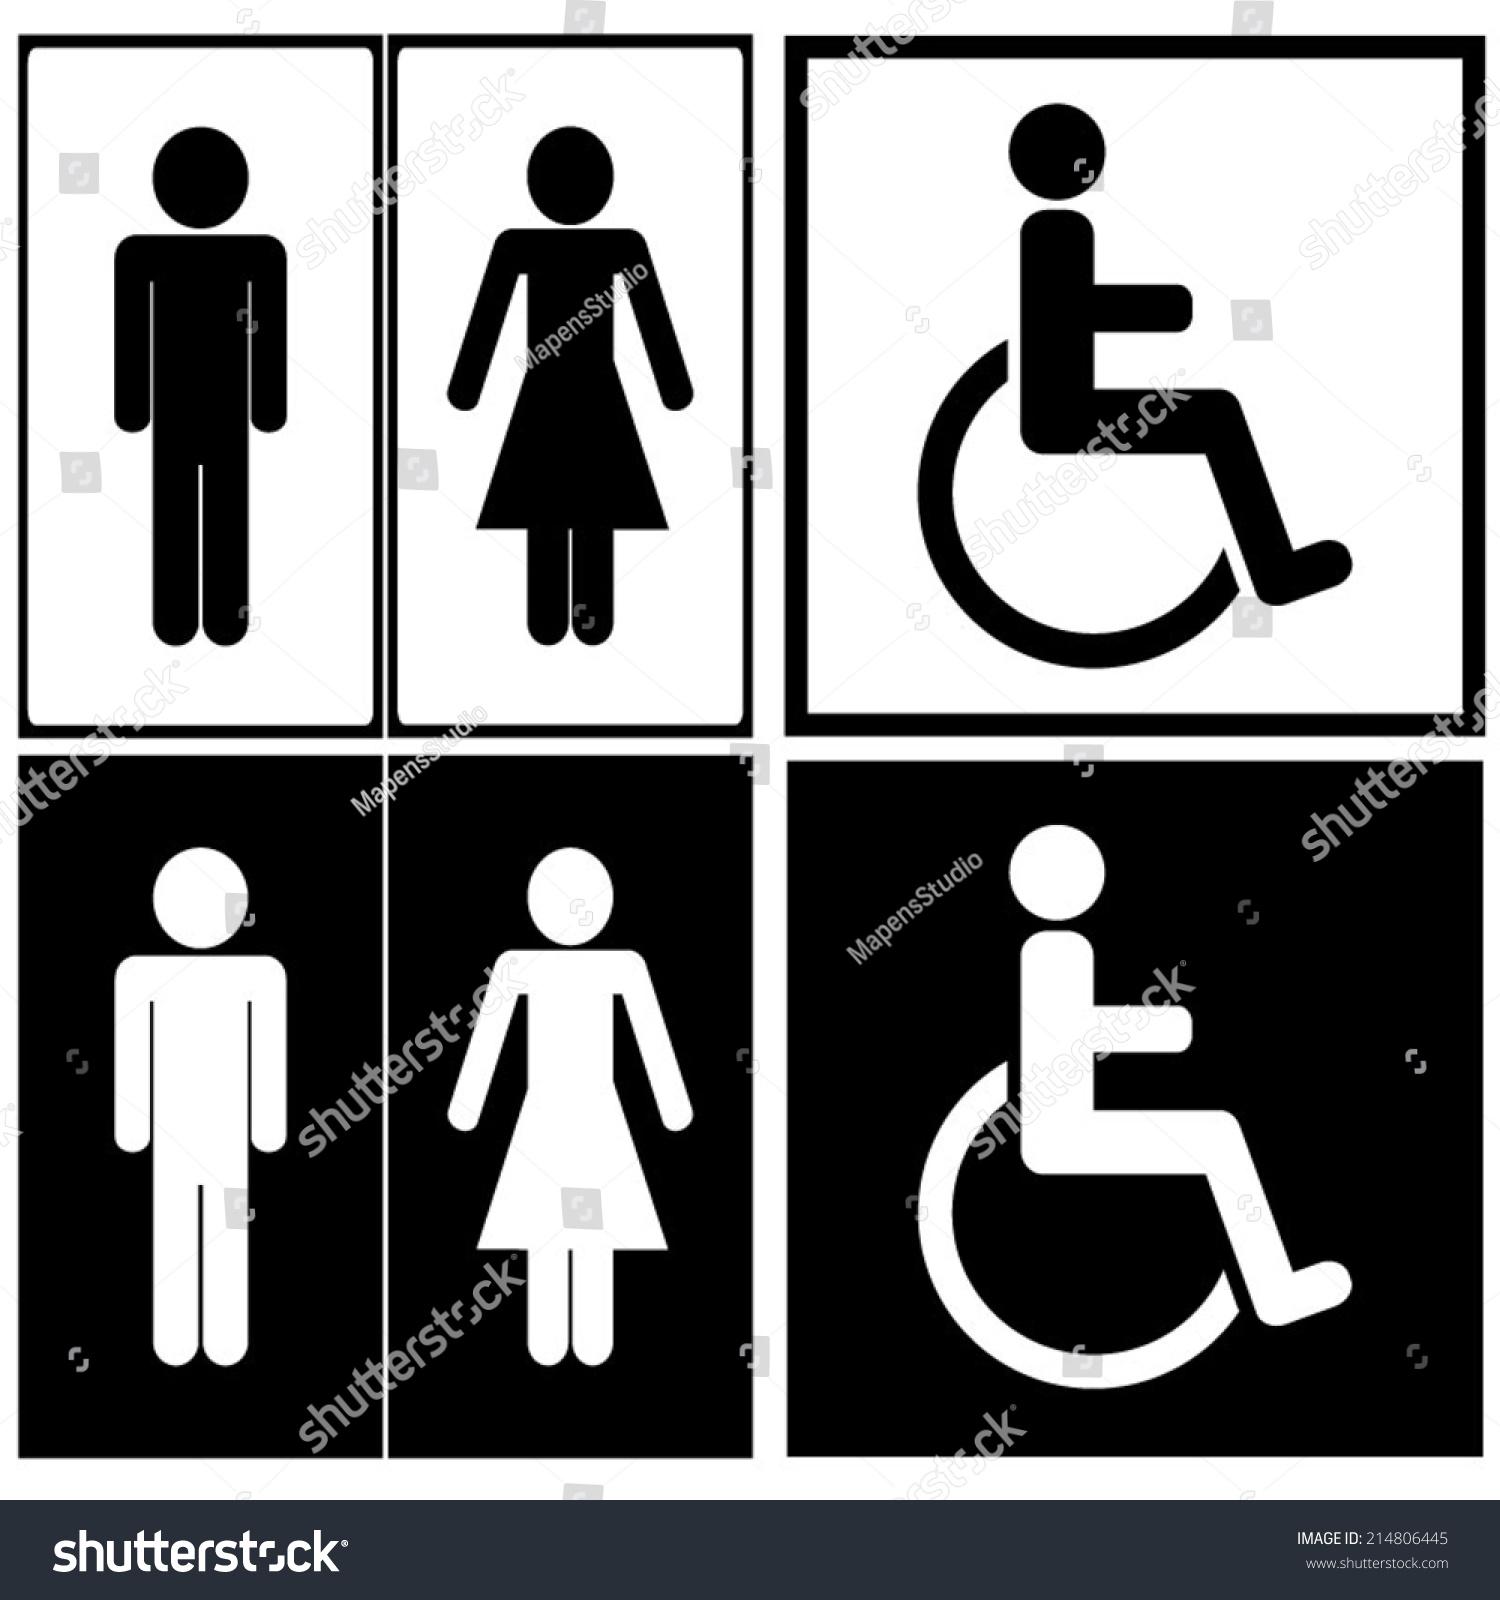 Man Women And Handicap Toilet Sign